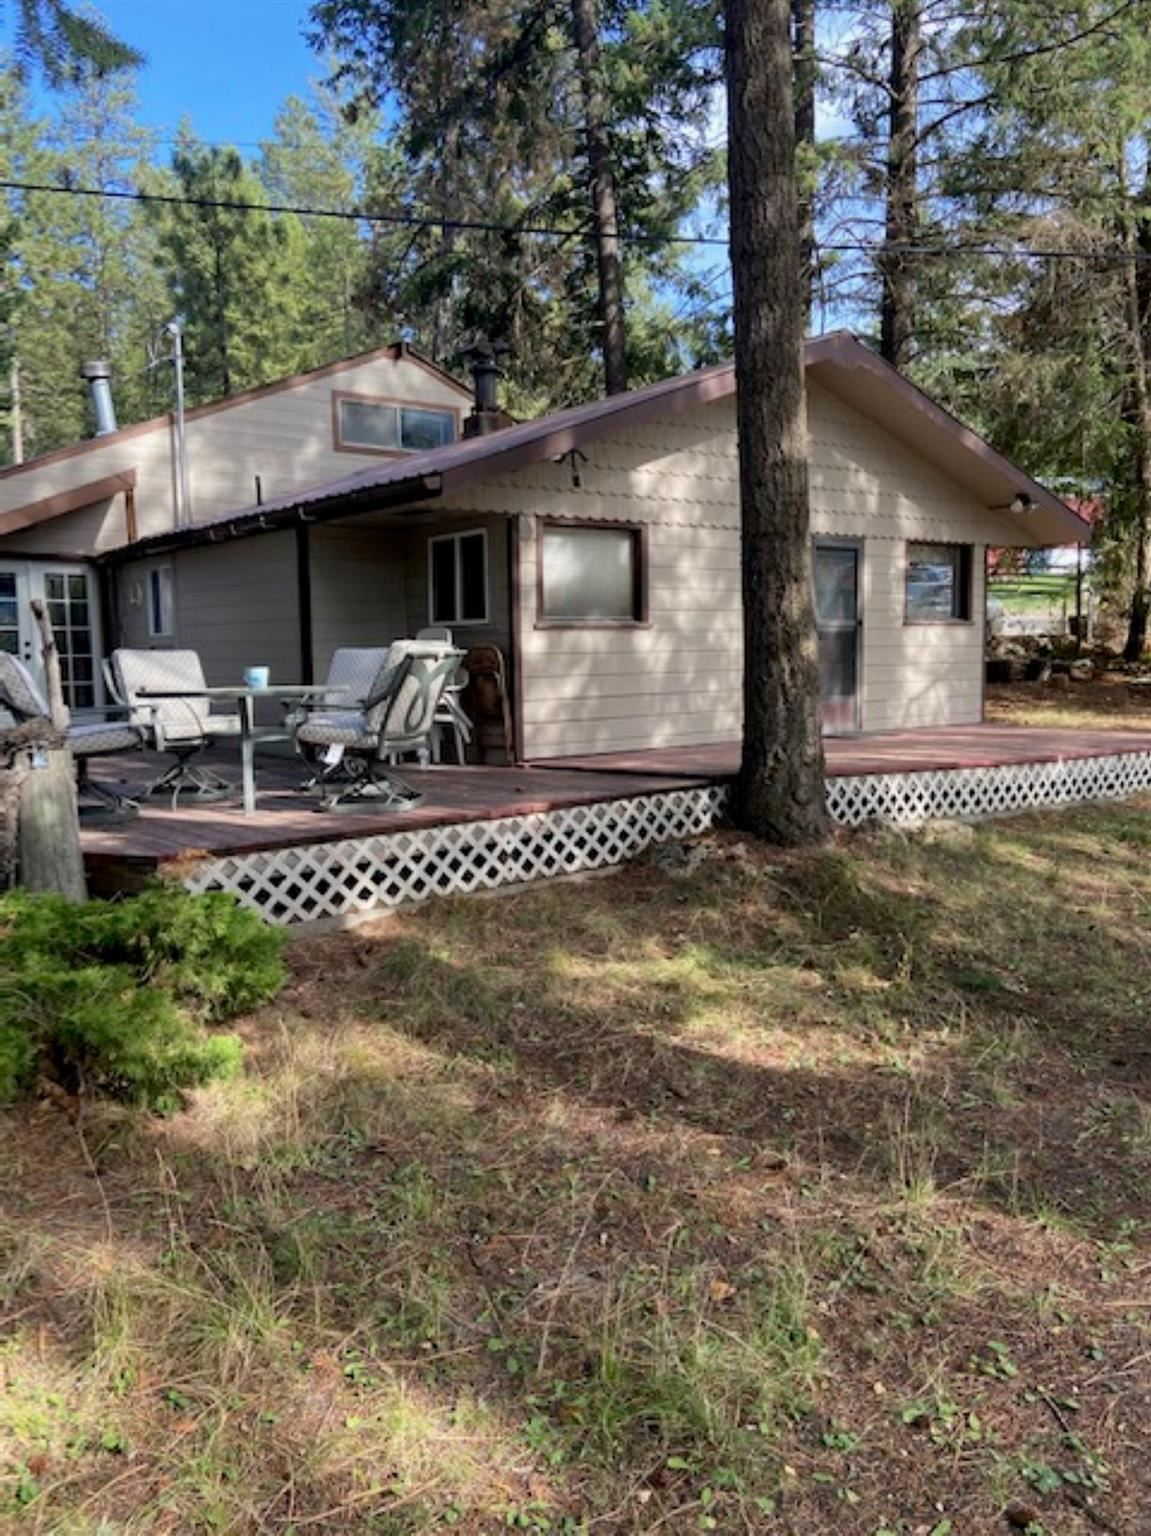 4548 Haney Rd, Loon Lake, WA 99148 - #: 202123024